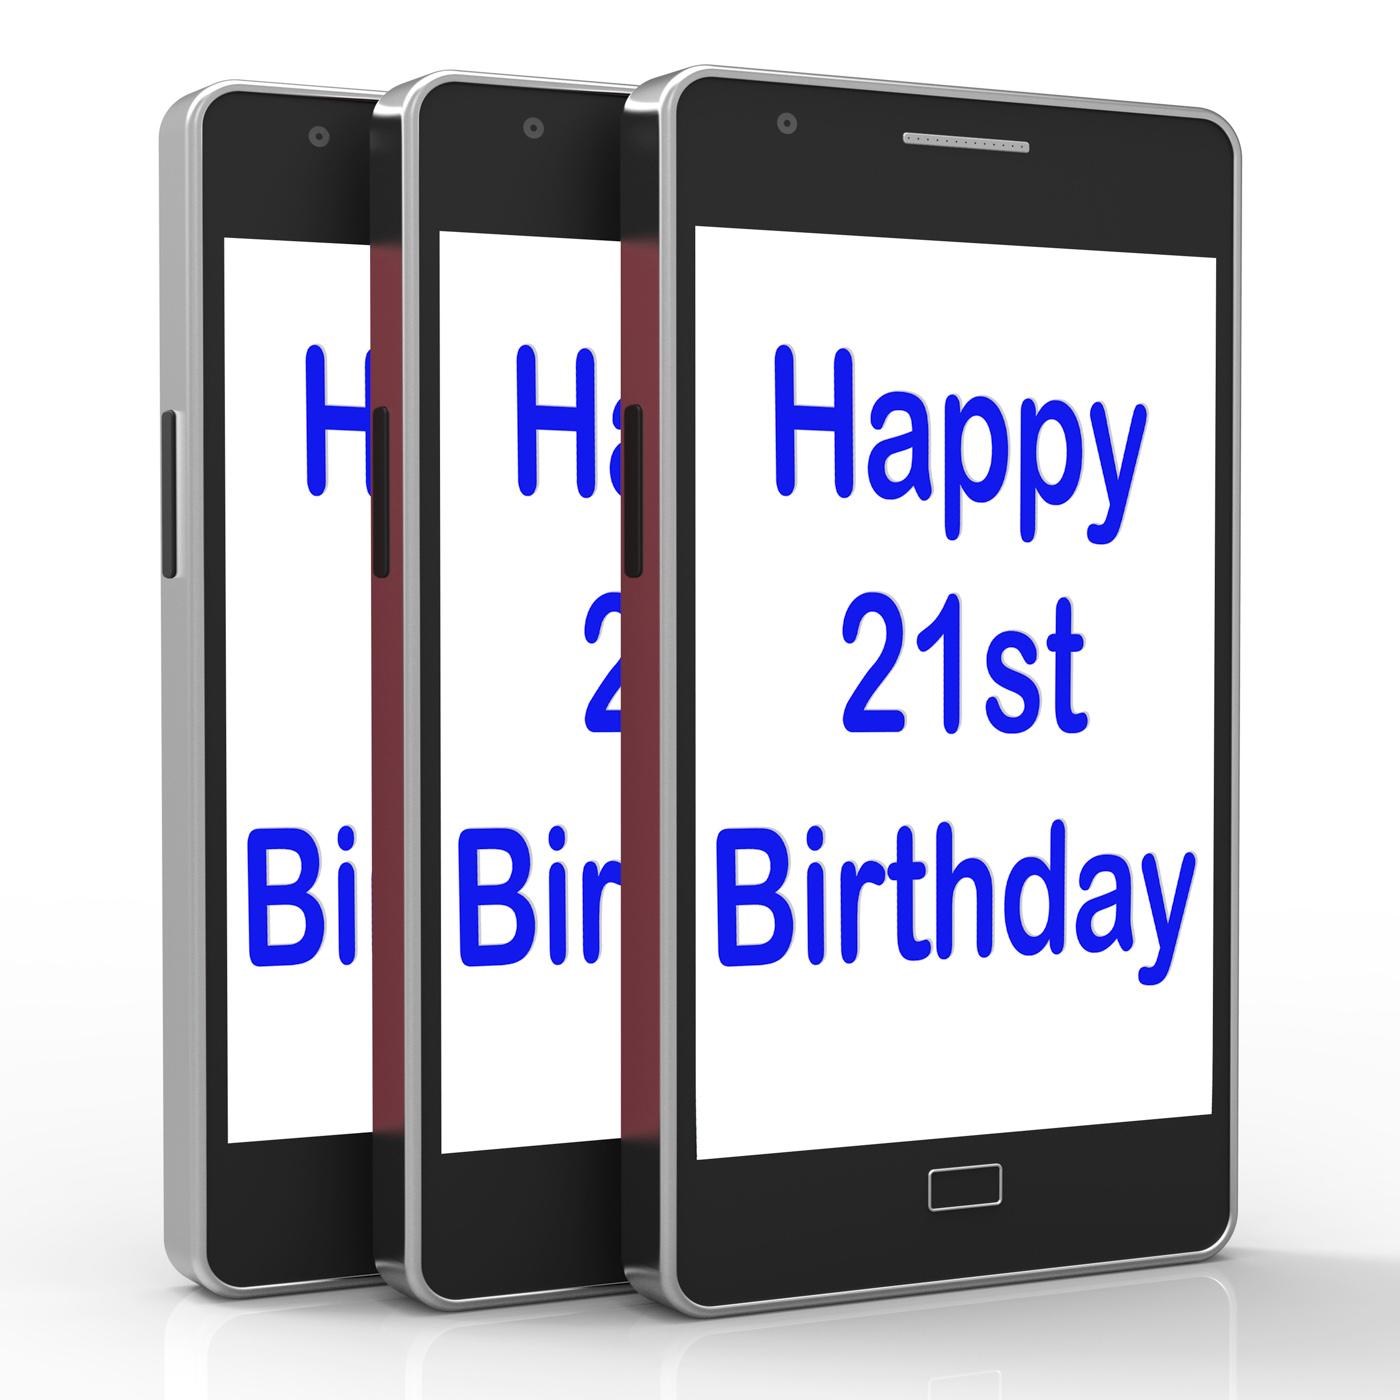 Happy 21st Birthday Smartphone Shows Congratulating On Twenty One Year, 21, Twenty-one, Twenty-first, Turn, HQ Photo